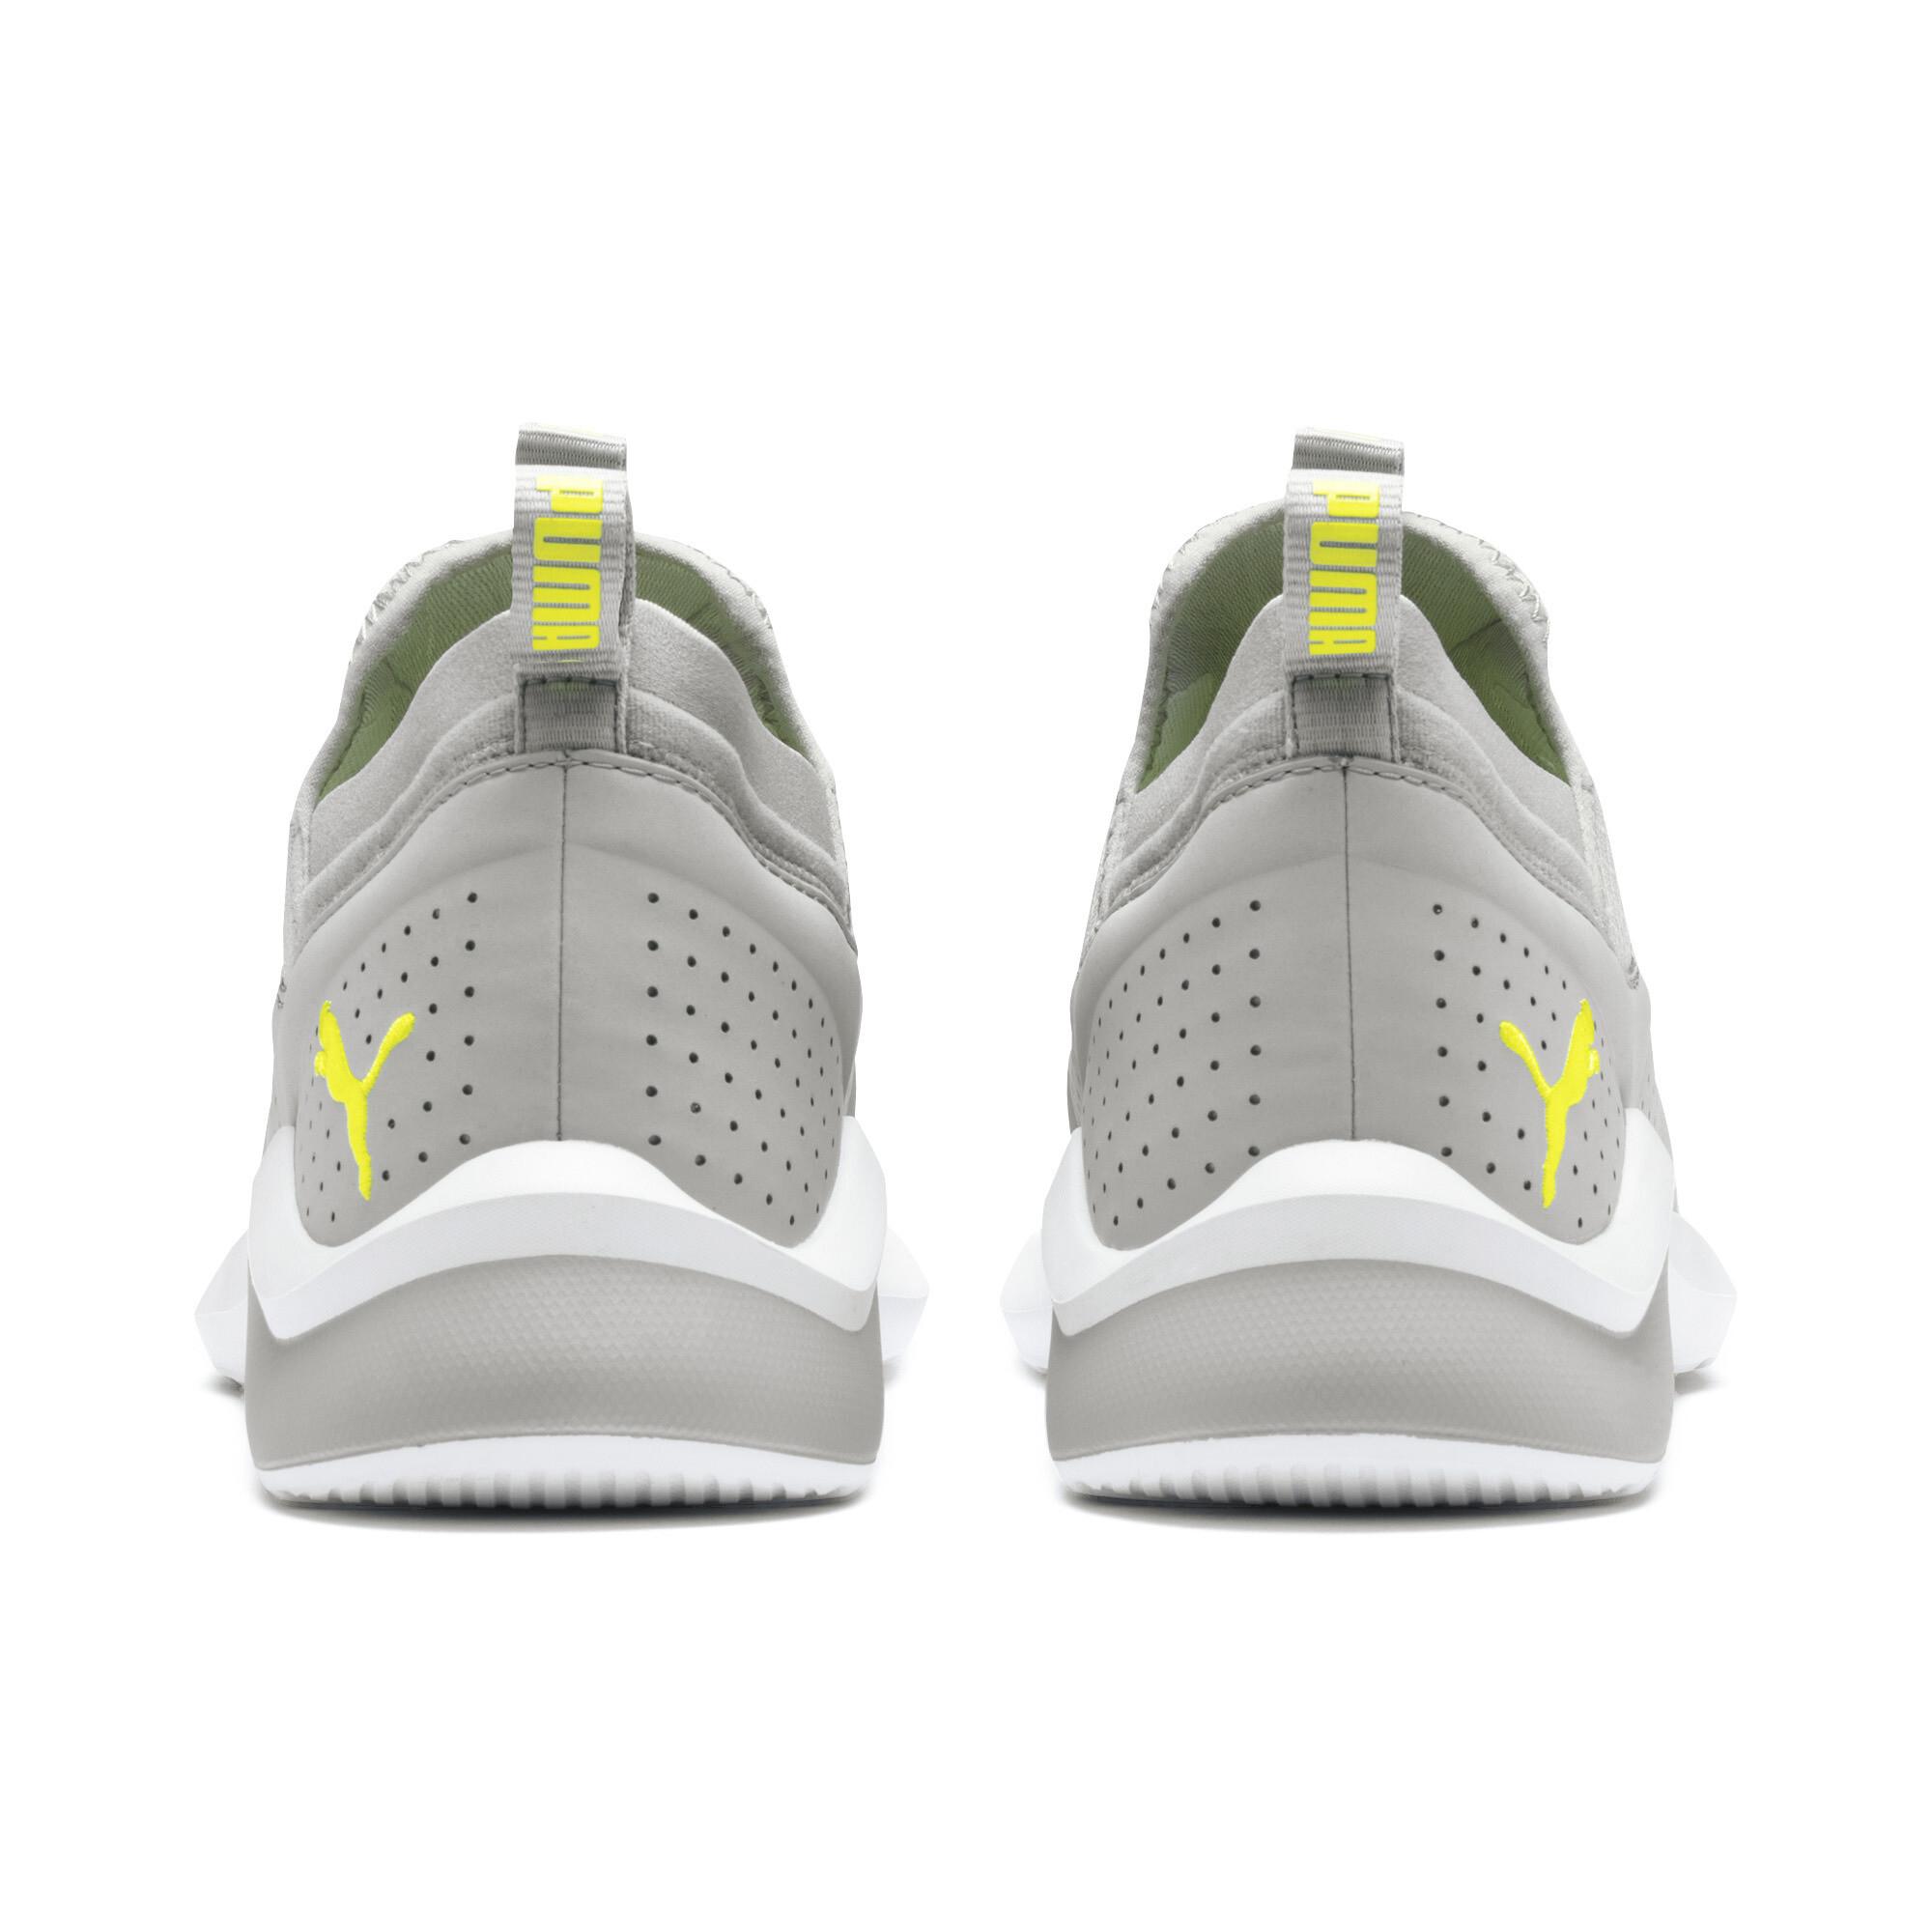 PUMA-Emergence-Lights-Men-039-s-Training-Shoes-Men-Shoe-Running thumbnail 3